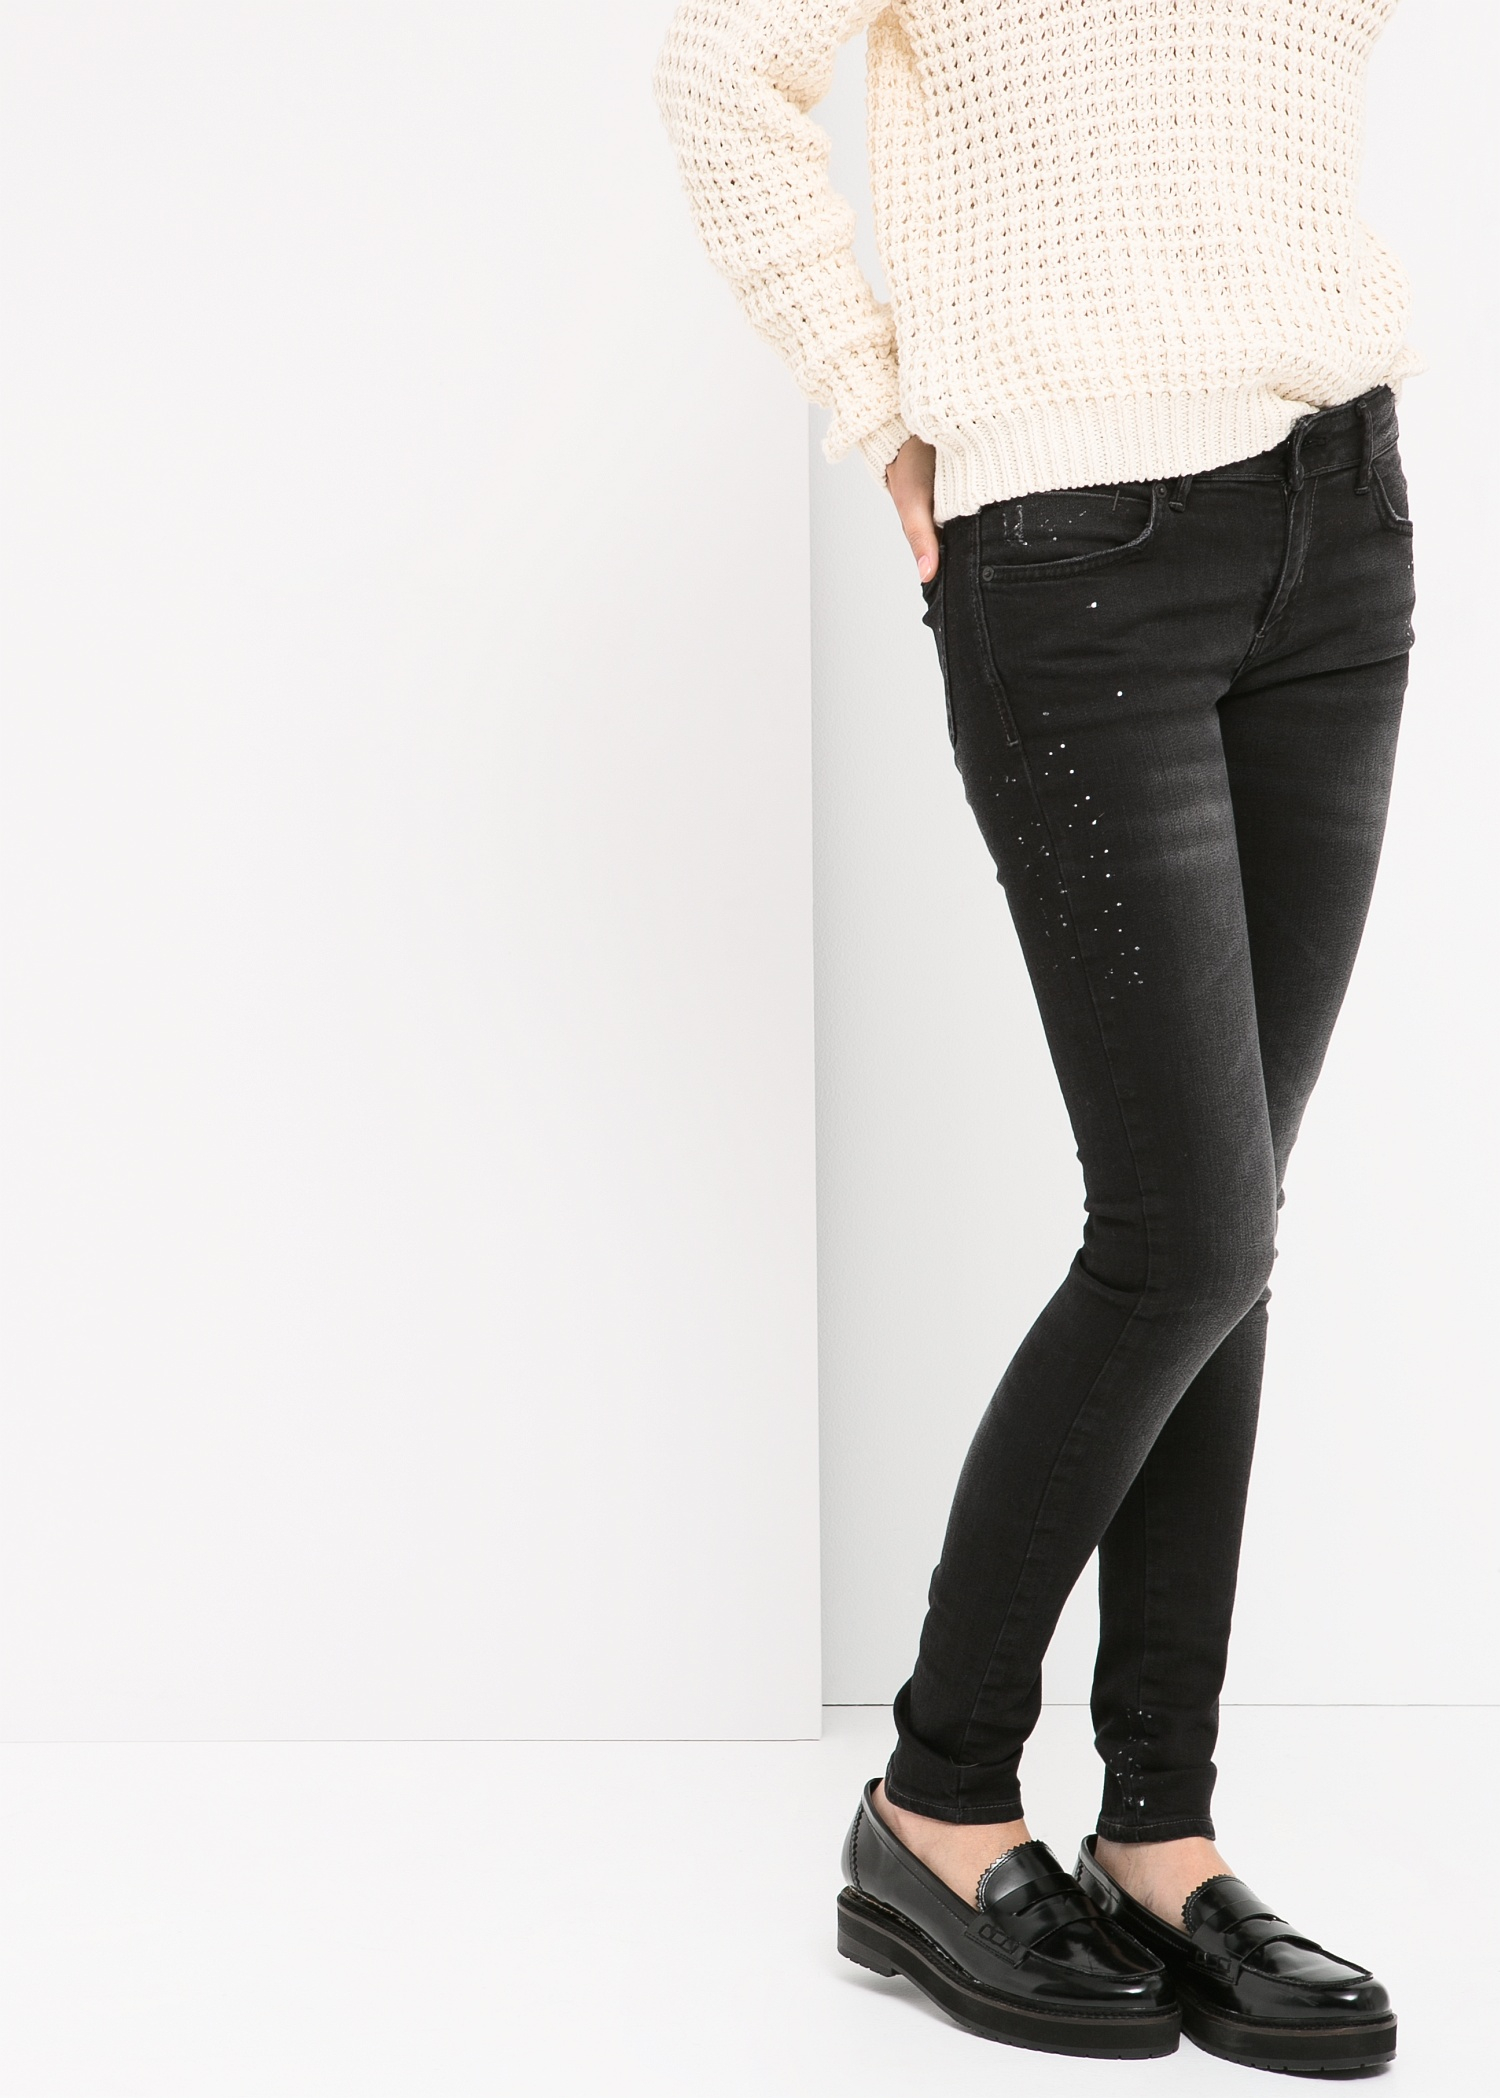 Lyst - Mango Super Slim-Fit Arizona Jeans in Black